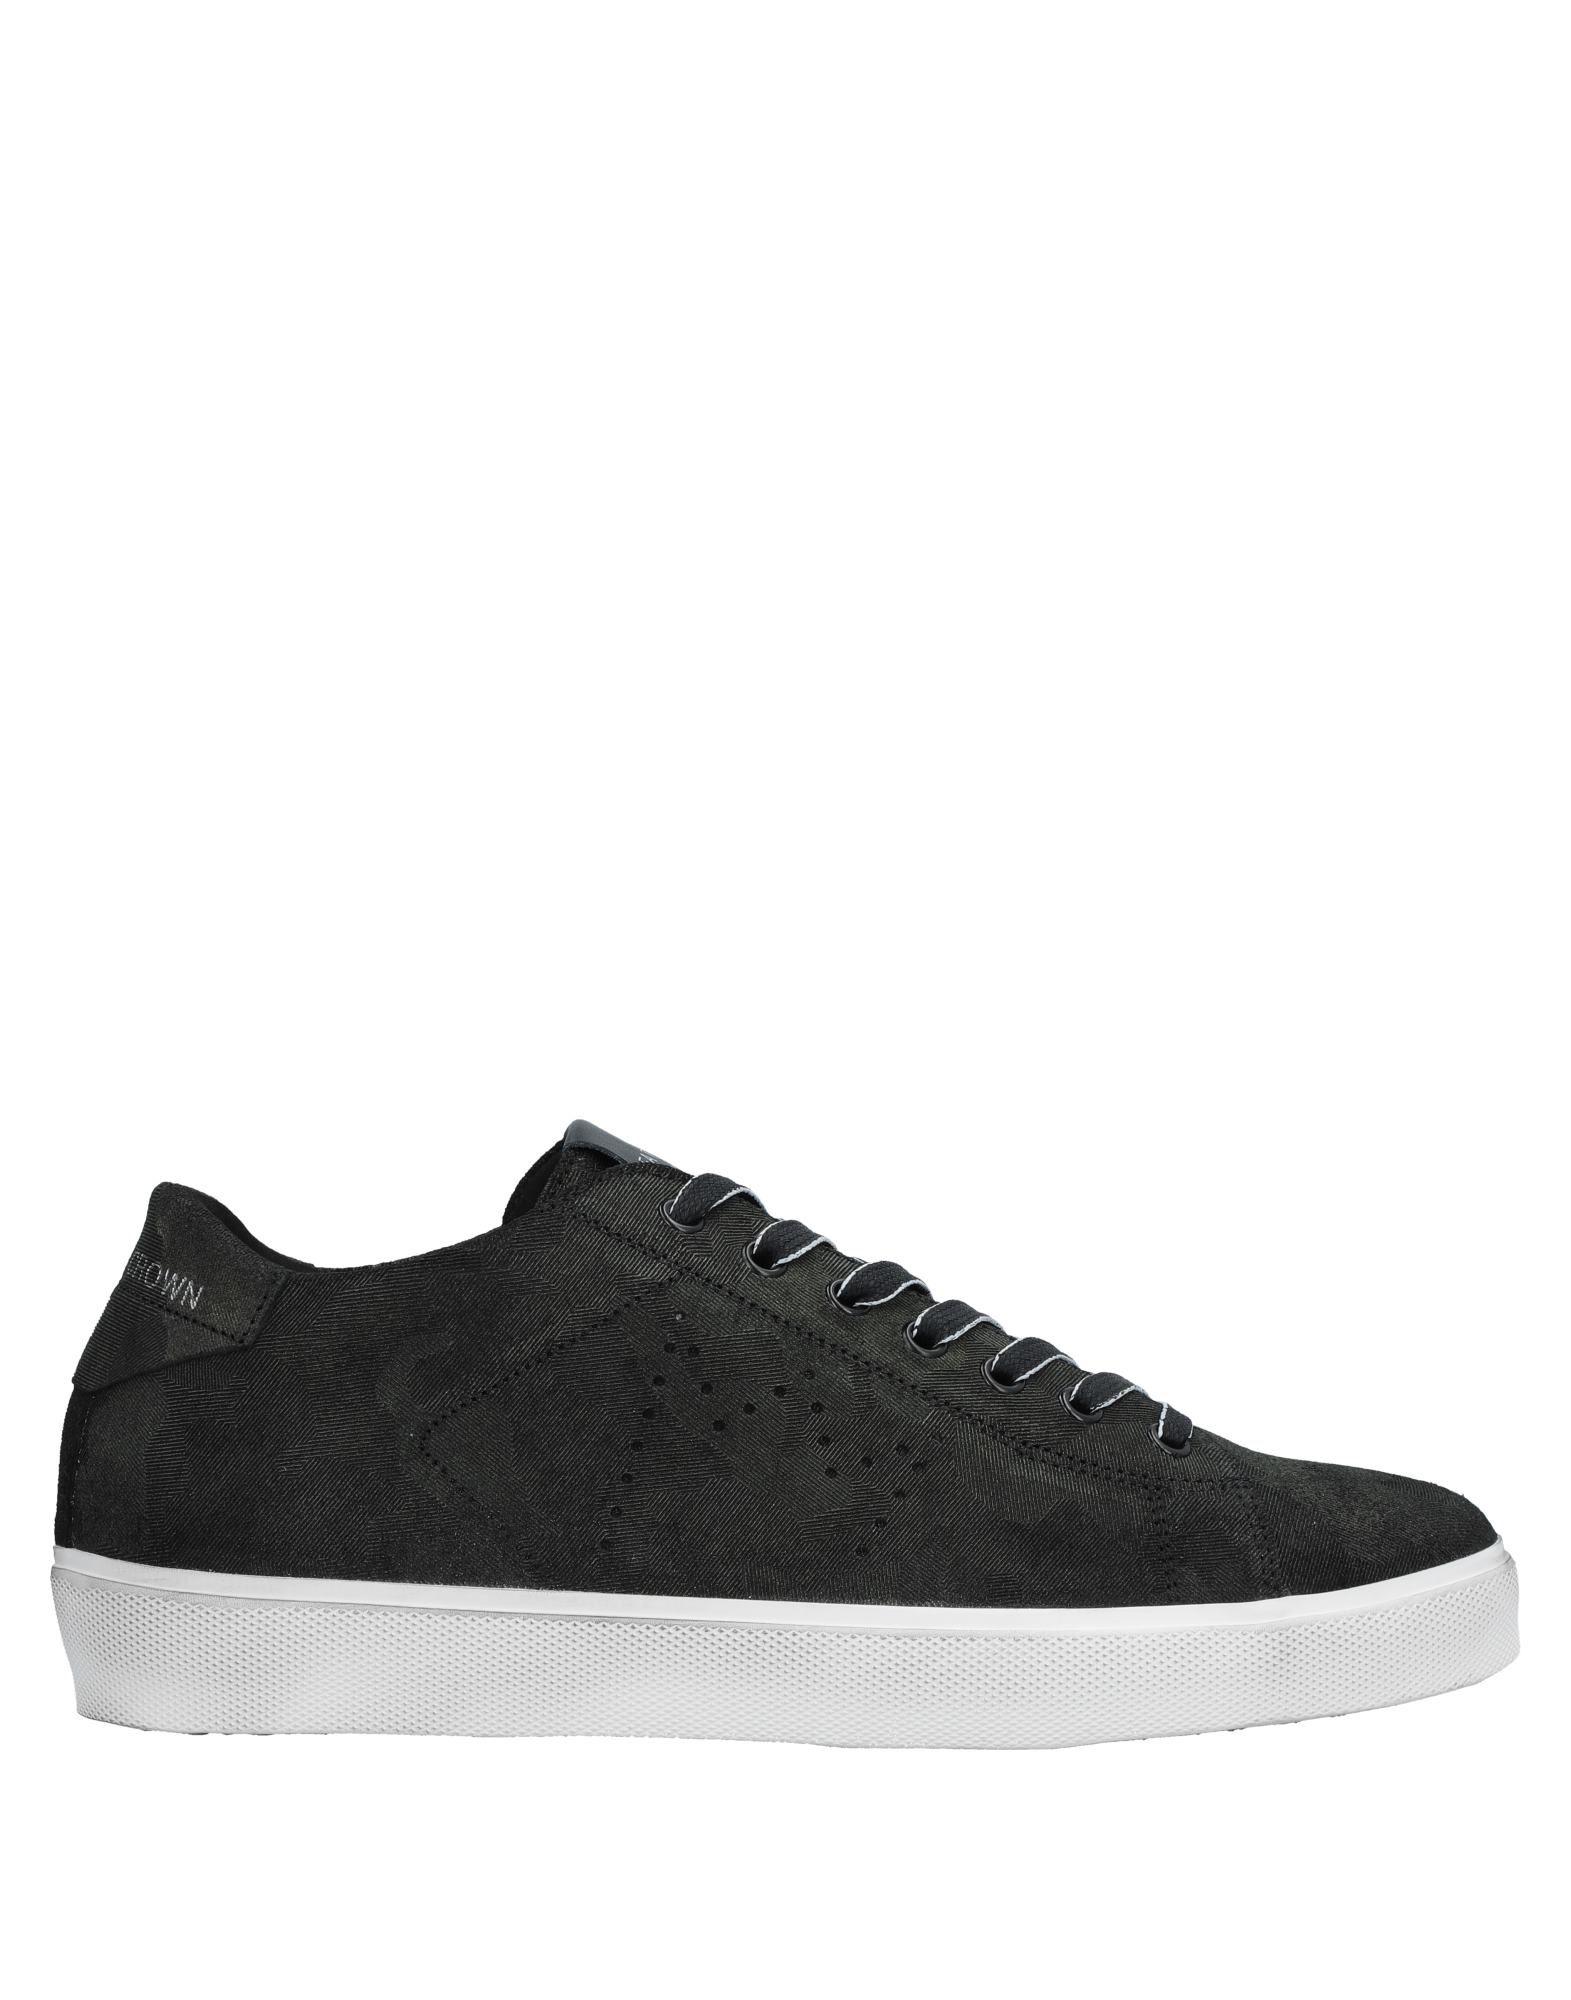 Sneakers Leather Crown Uomo - 11536383FJ